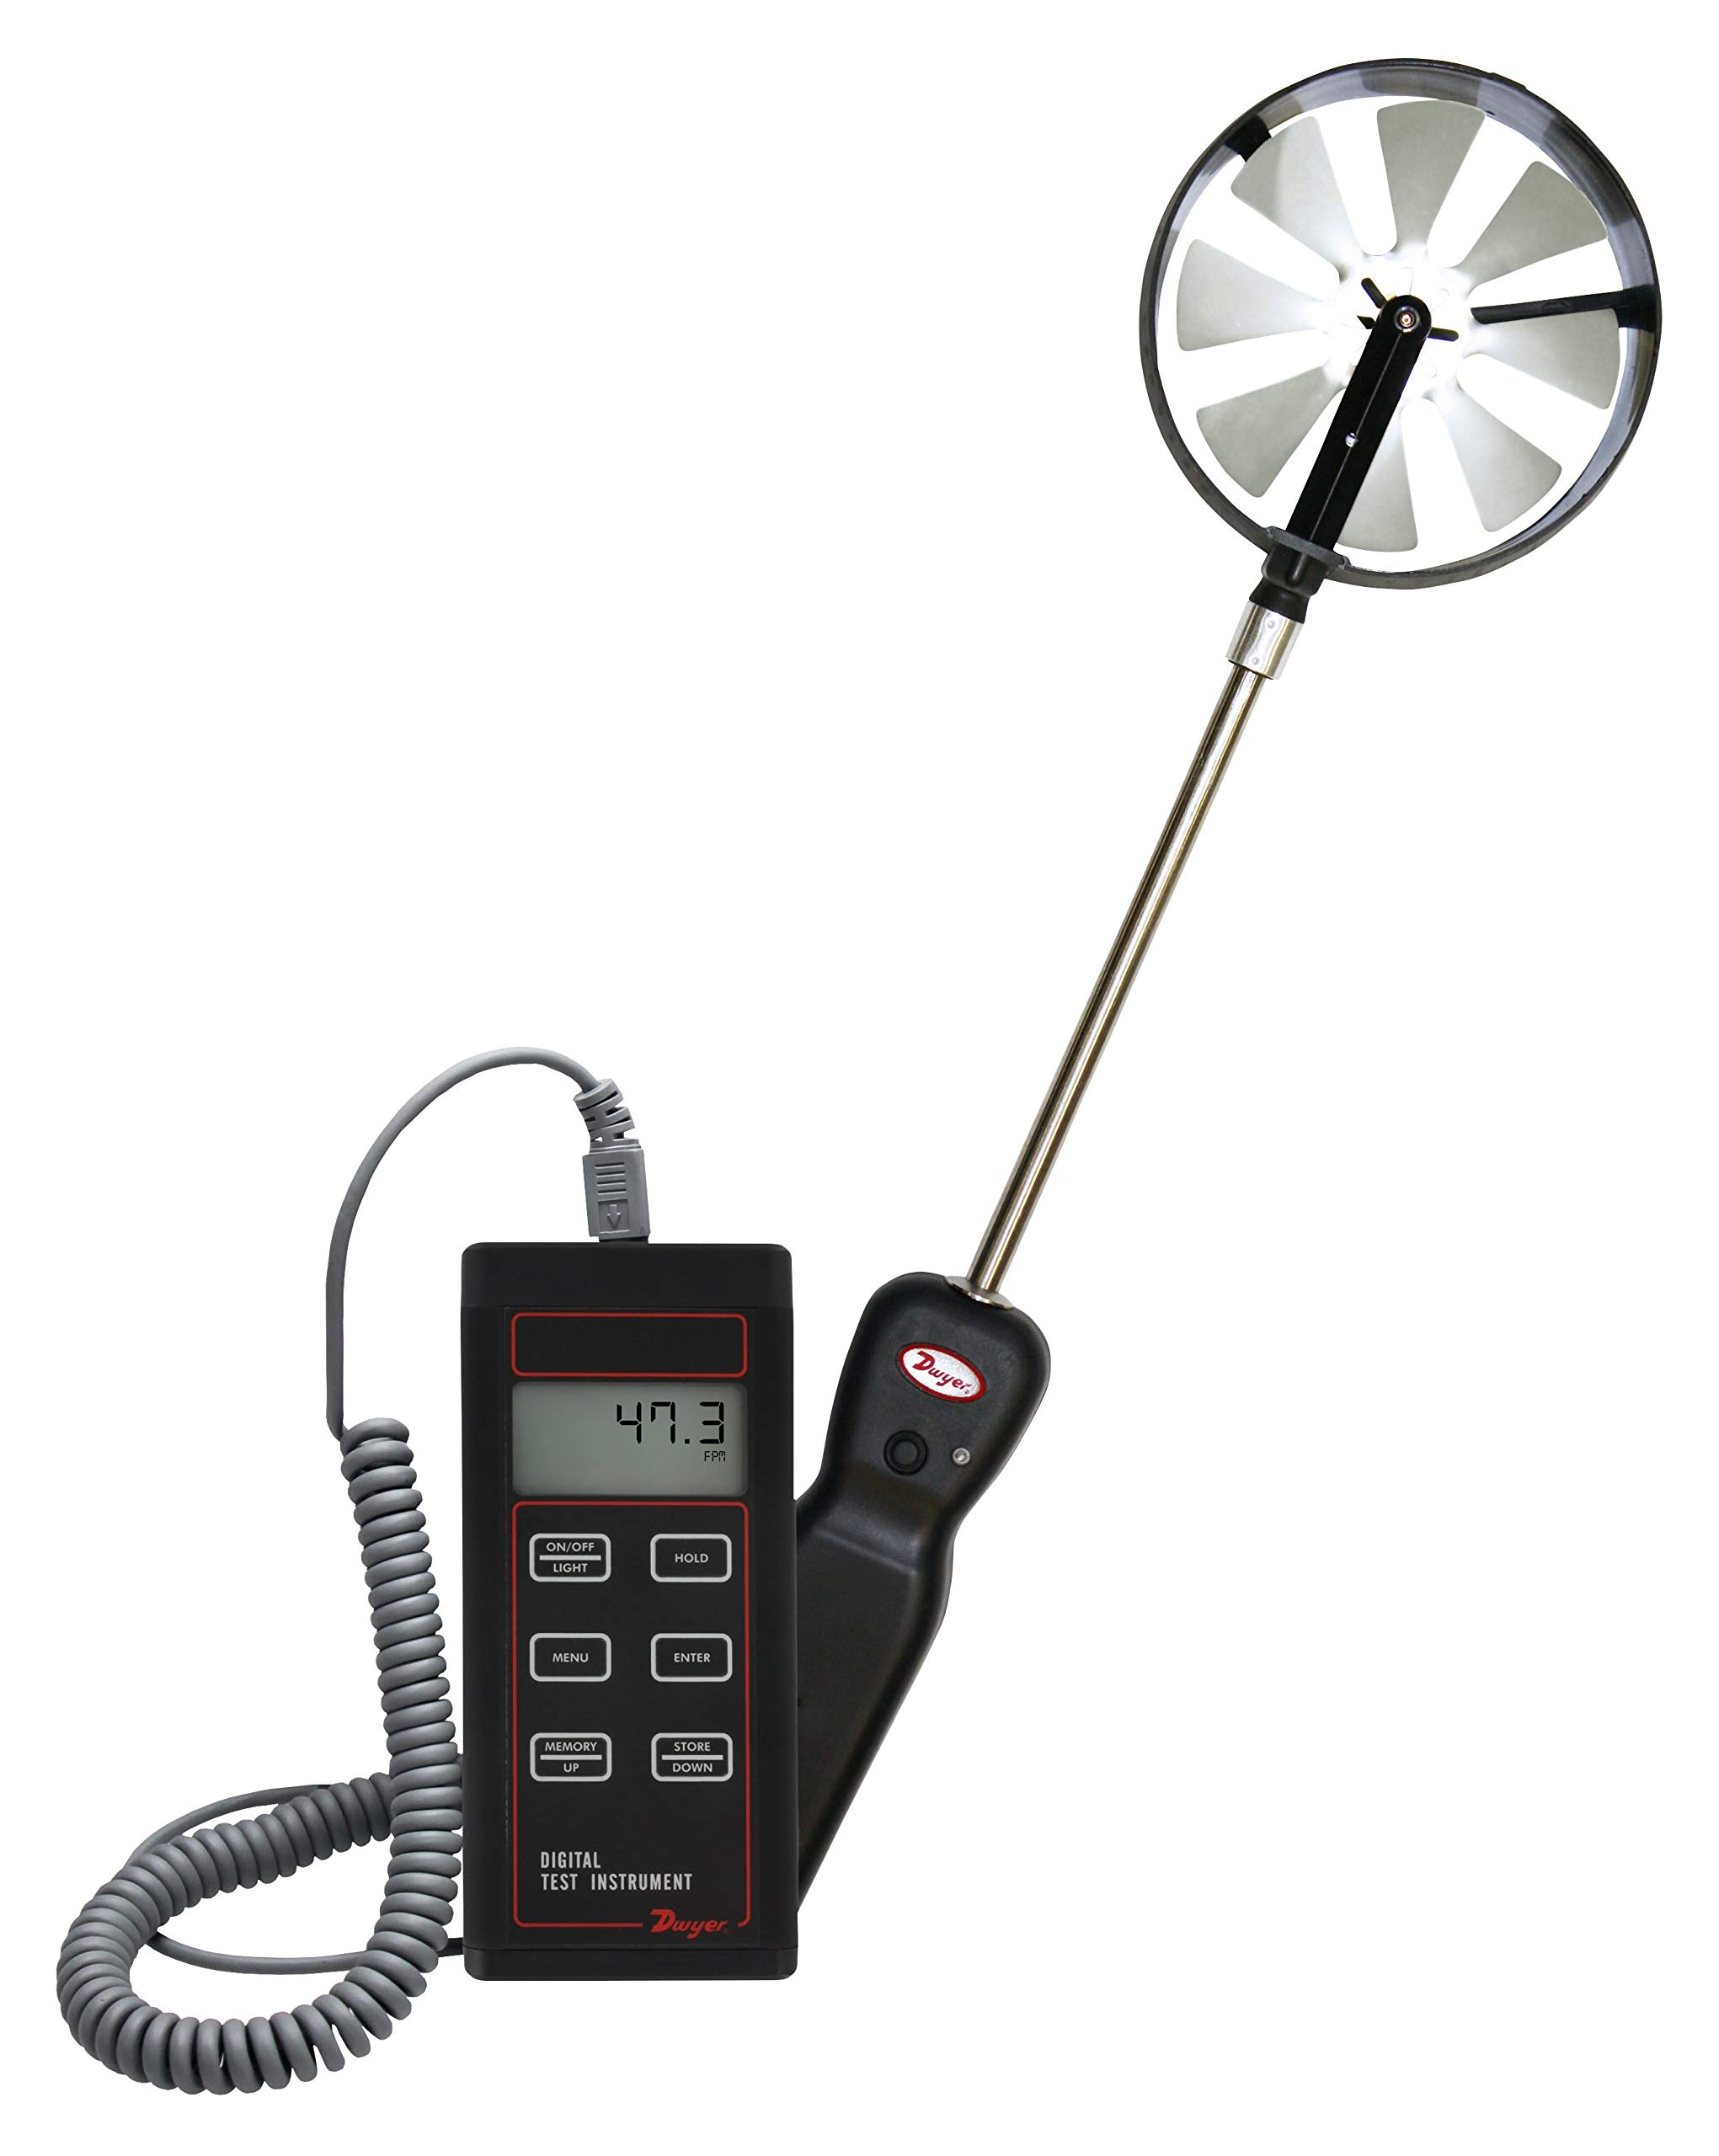 Dwyer 473B-1 Vane Thermo-Anemometer